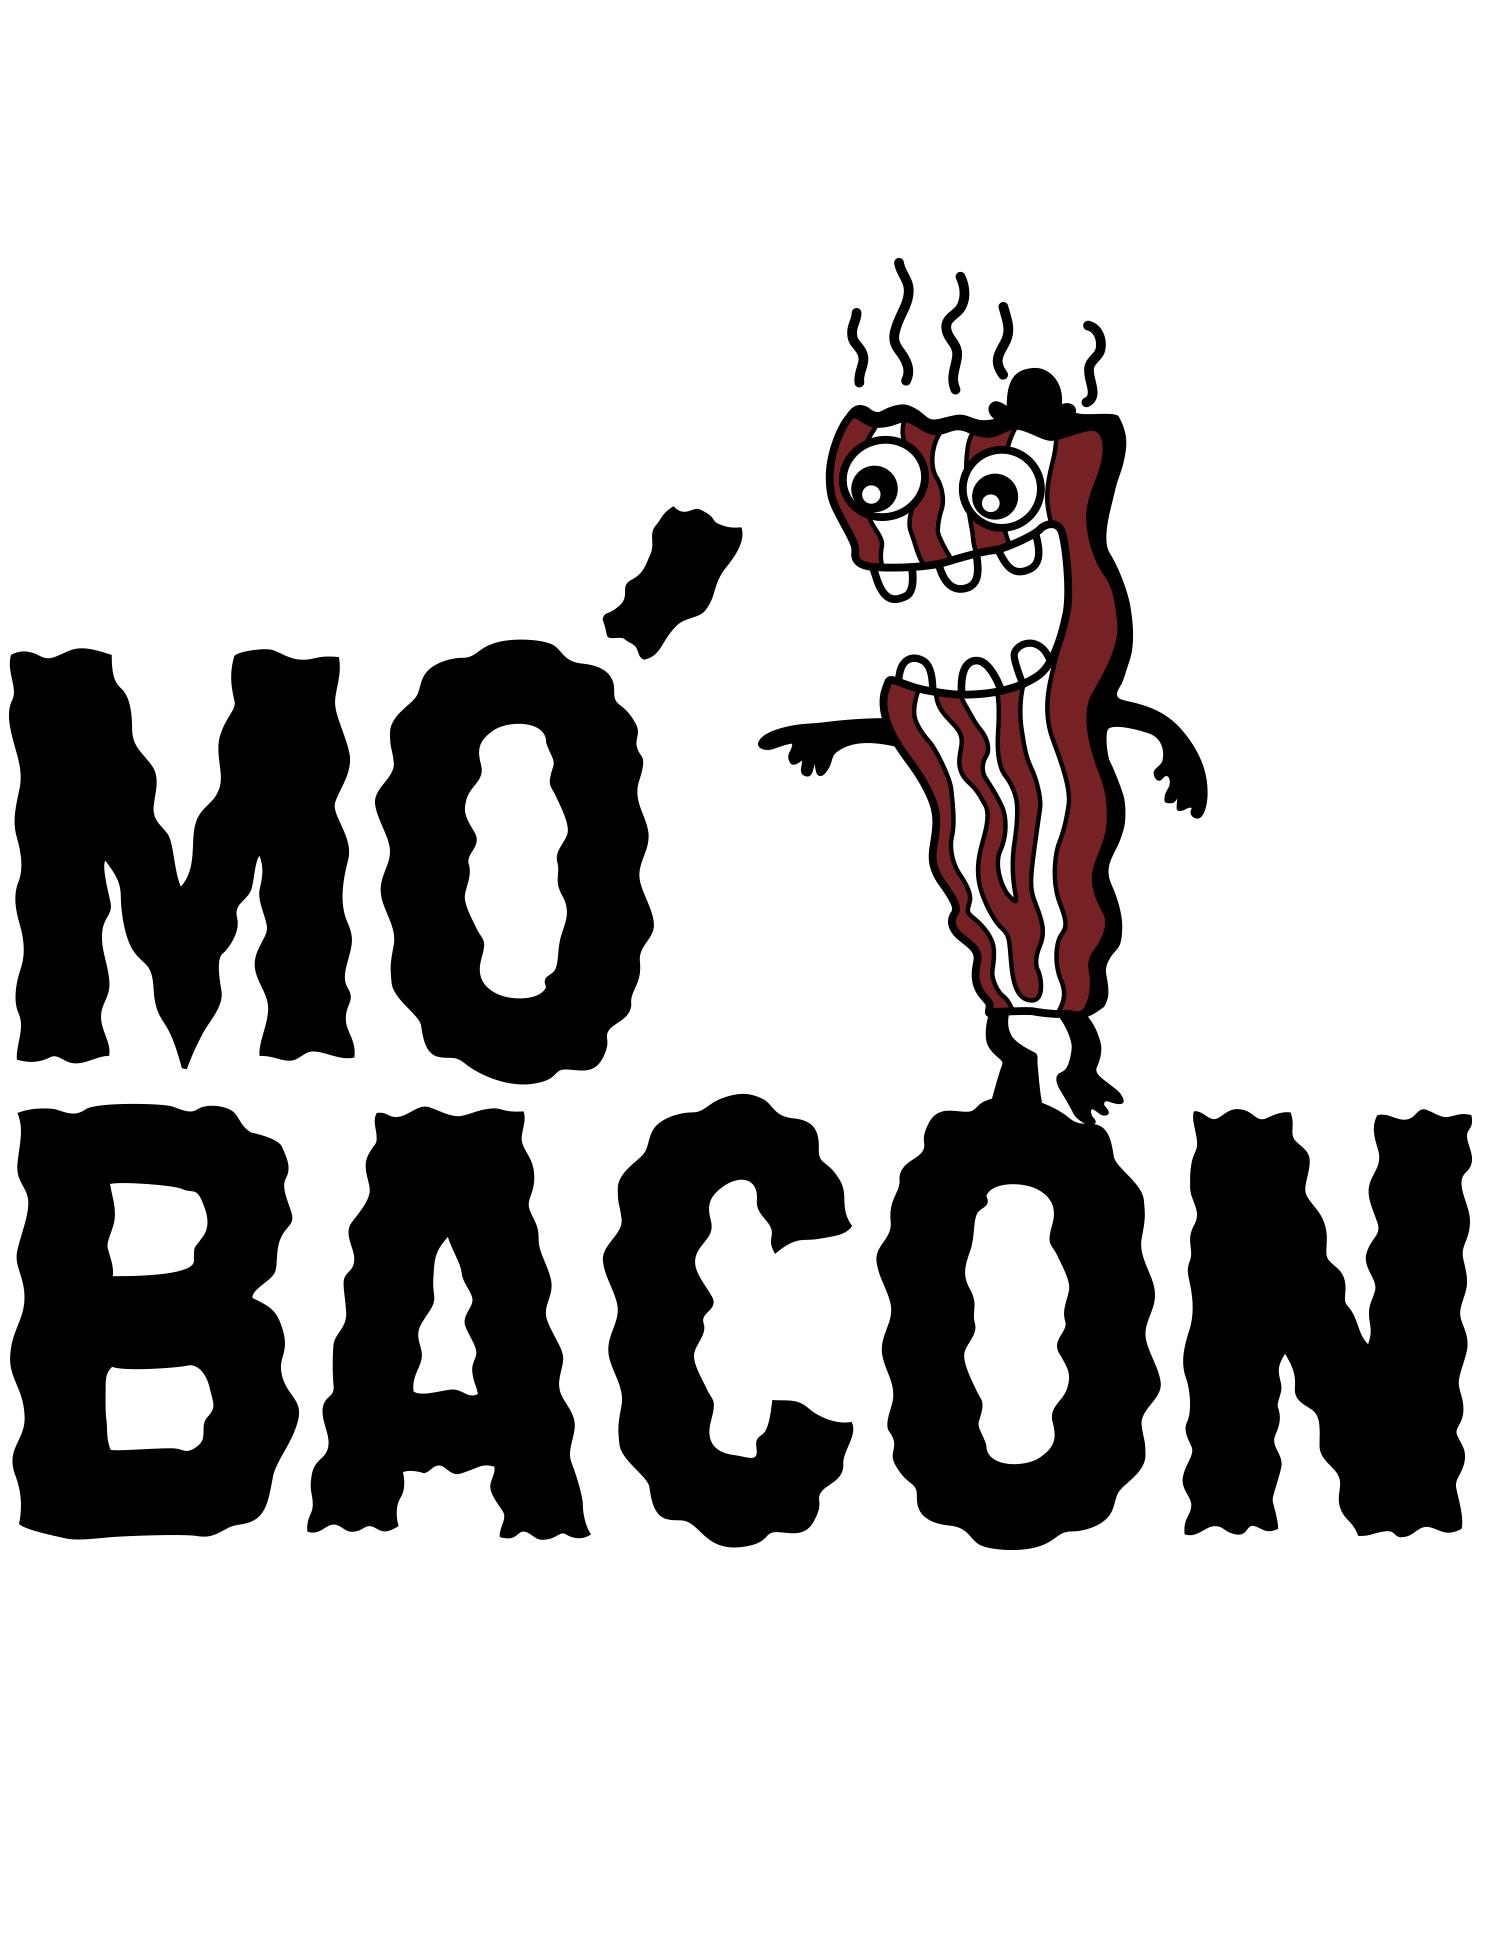 mo_bacon_type_andi_bird.png